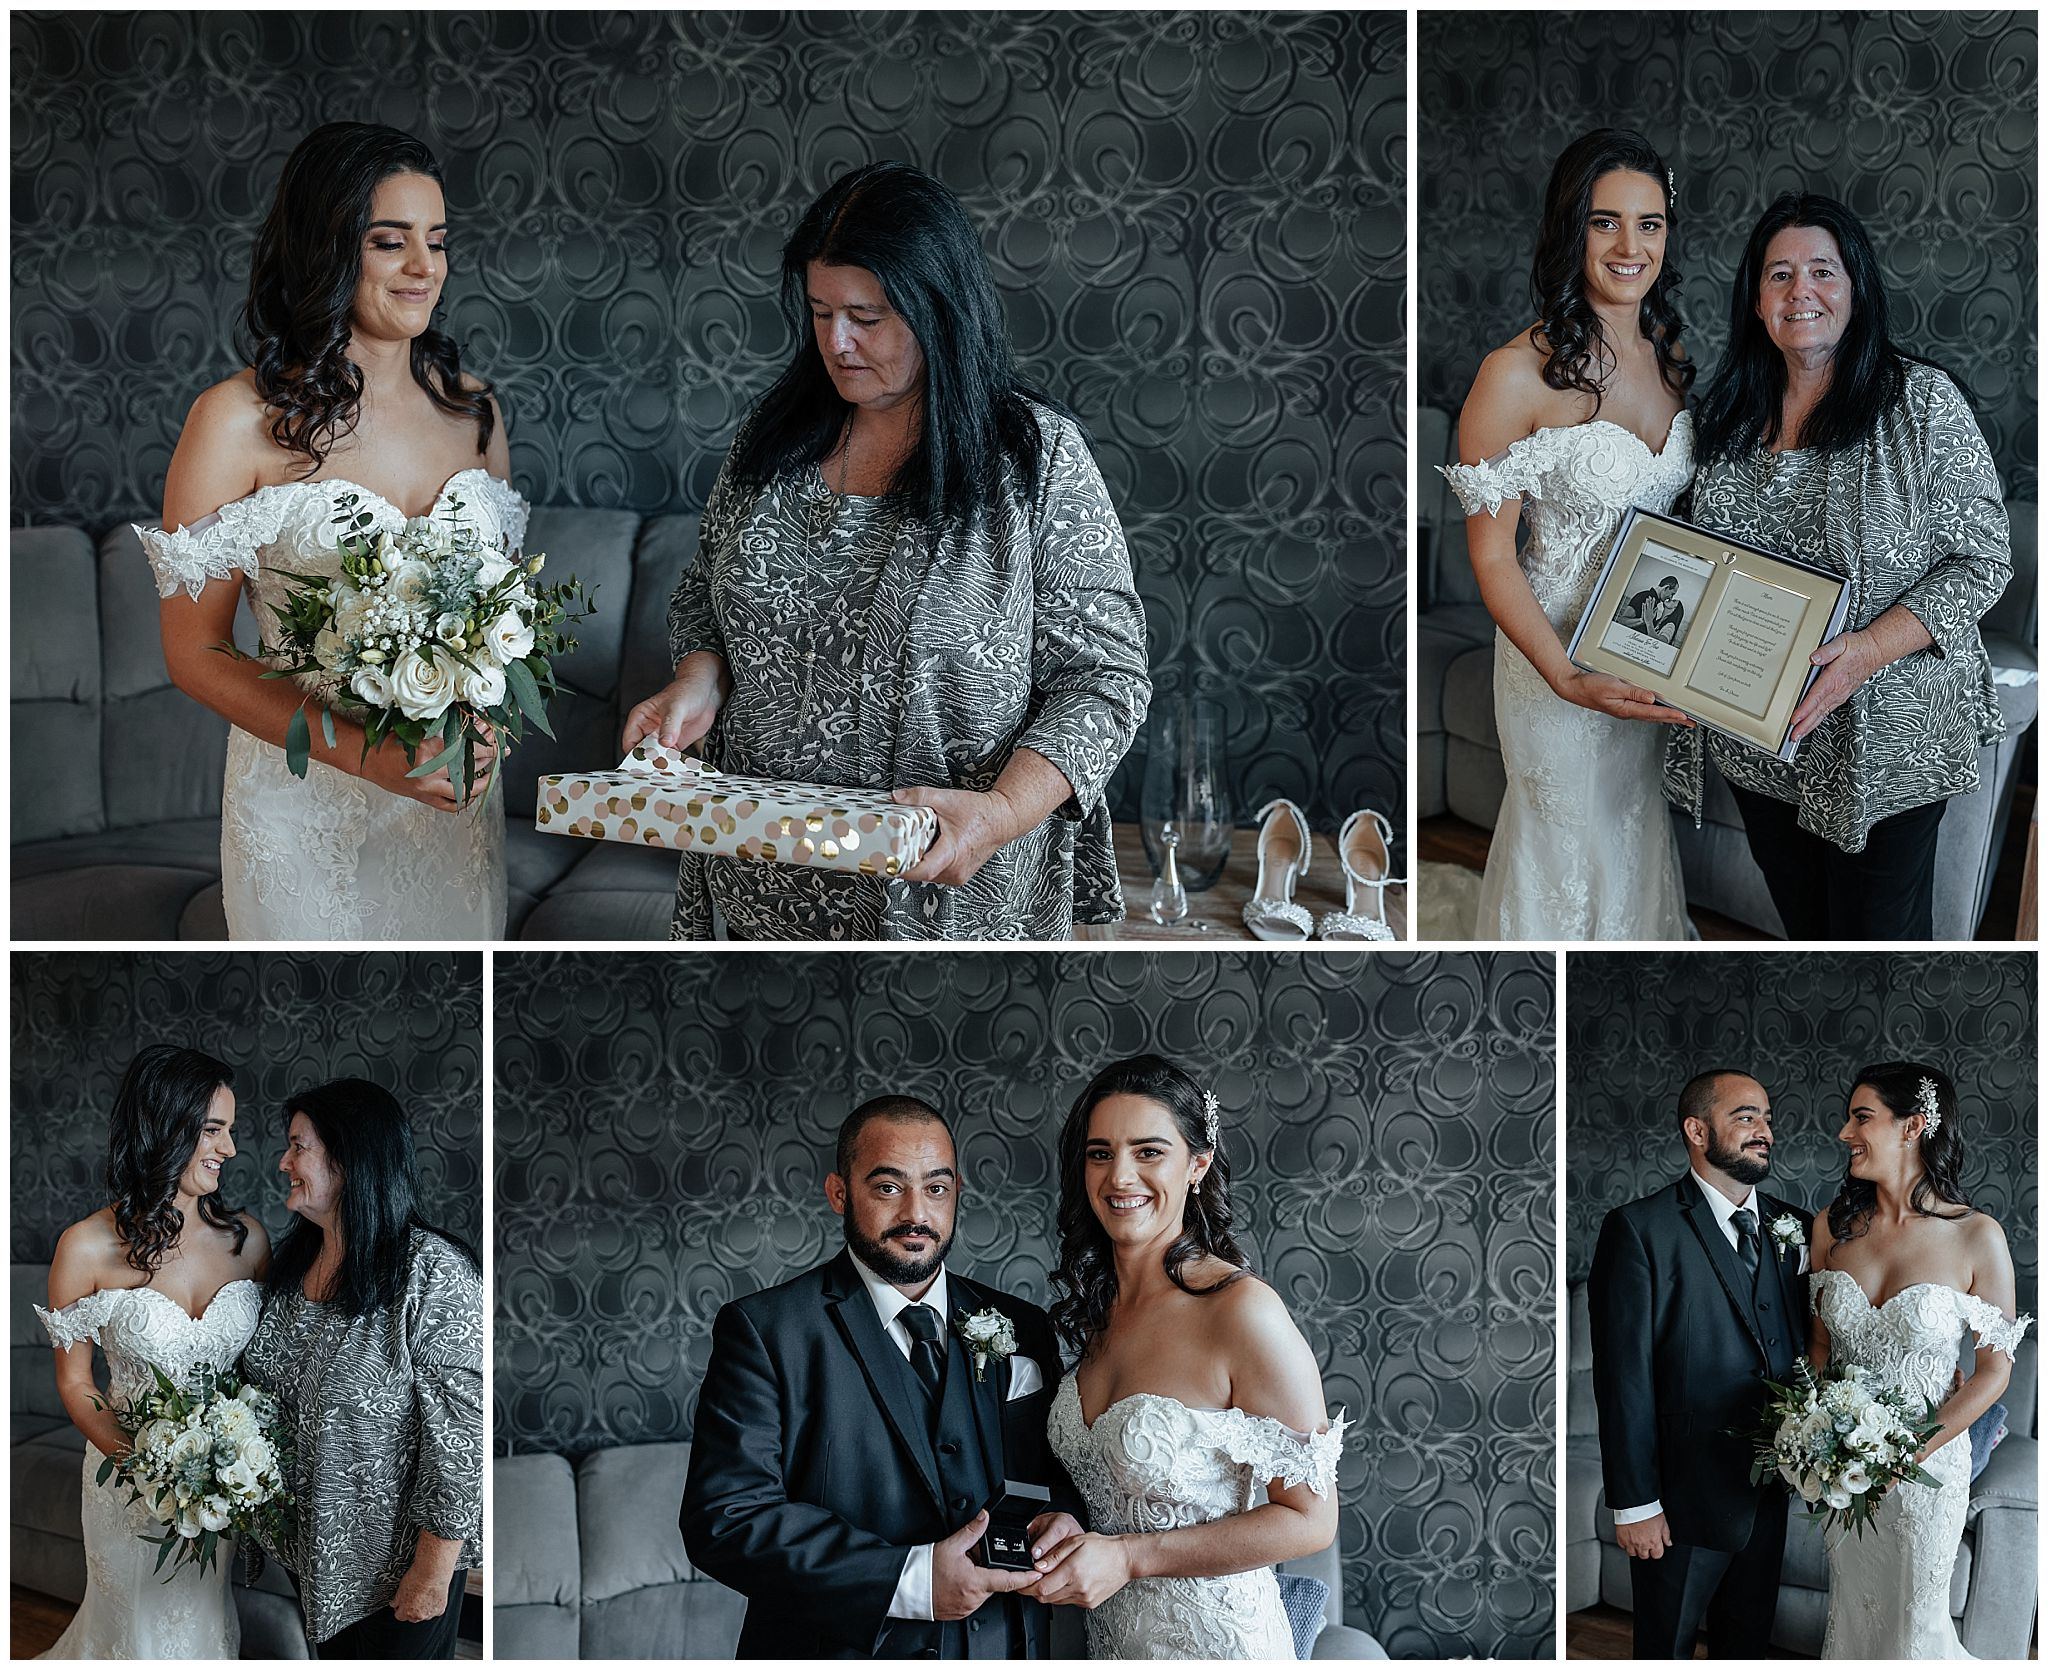 Brides Wedding day preparations